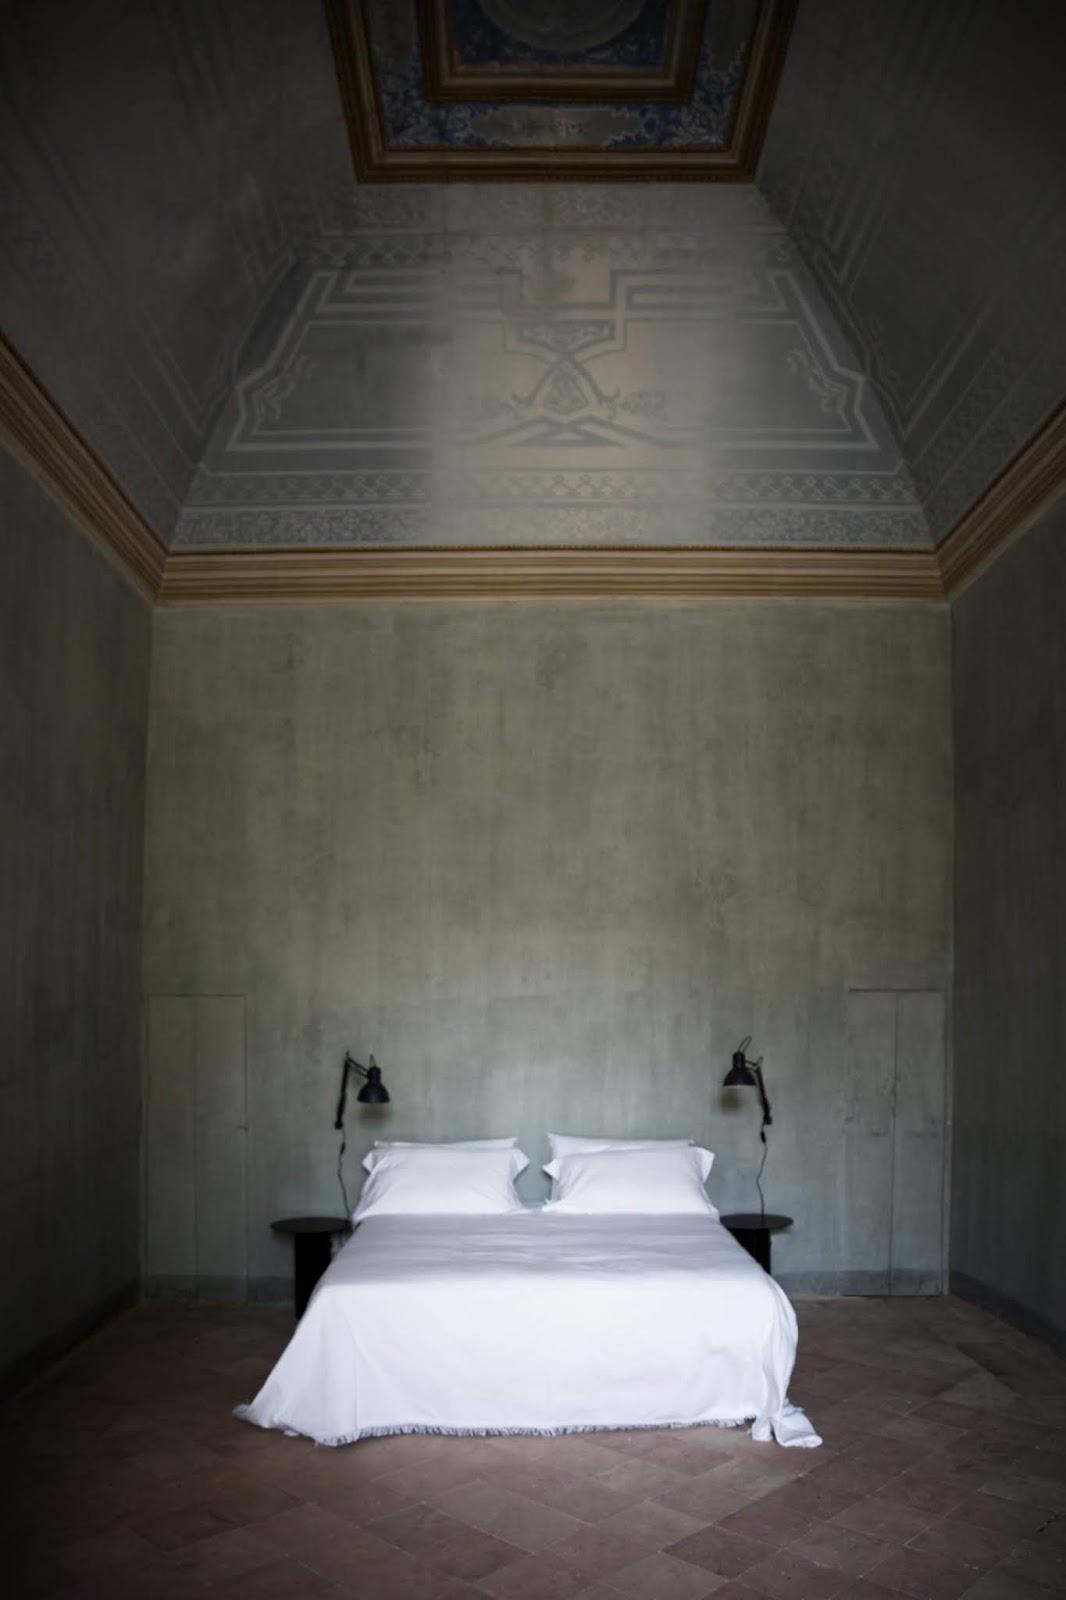 palazzo_daniele_-_project_by_ludovica_roberto_palomba_-_credit_pic_enrico_costantini_3.jpg